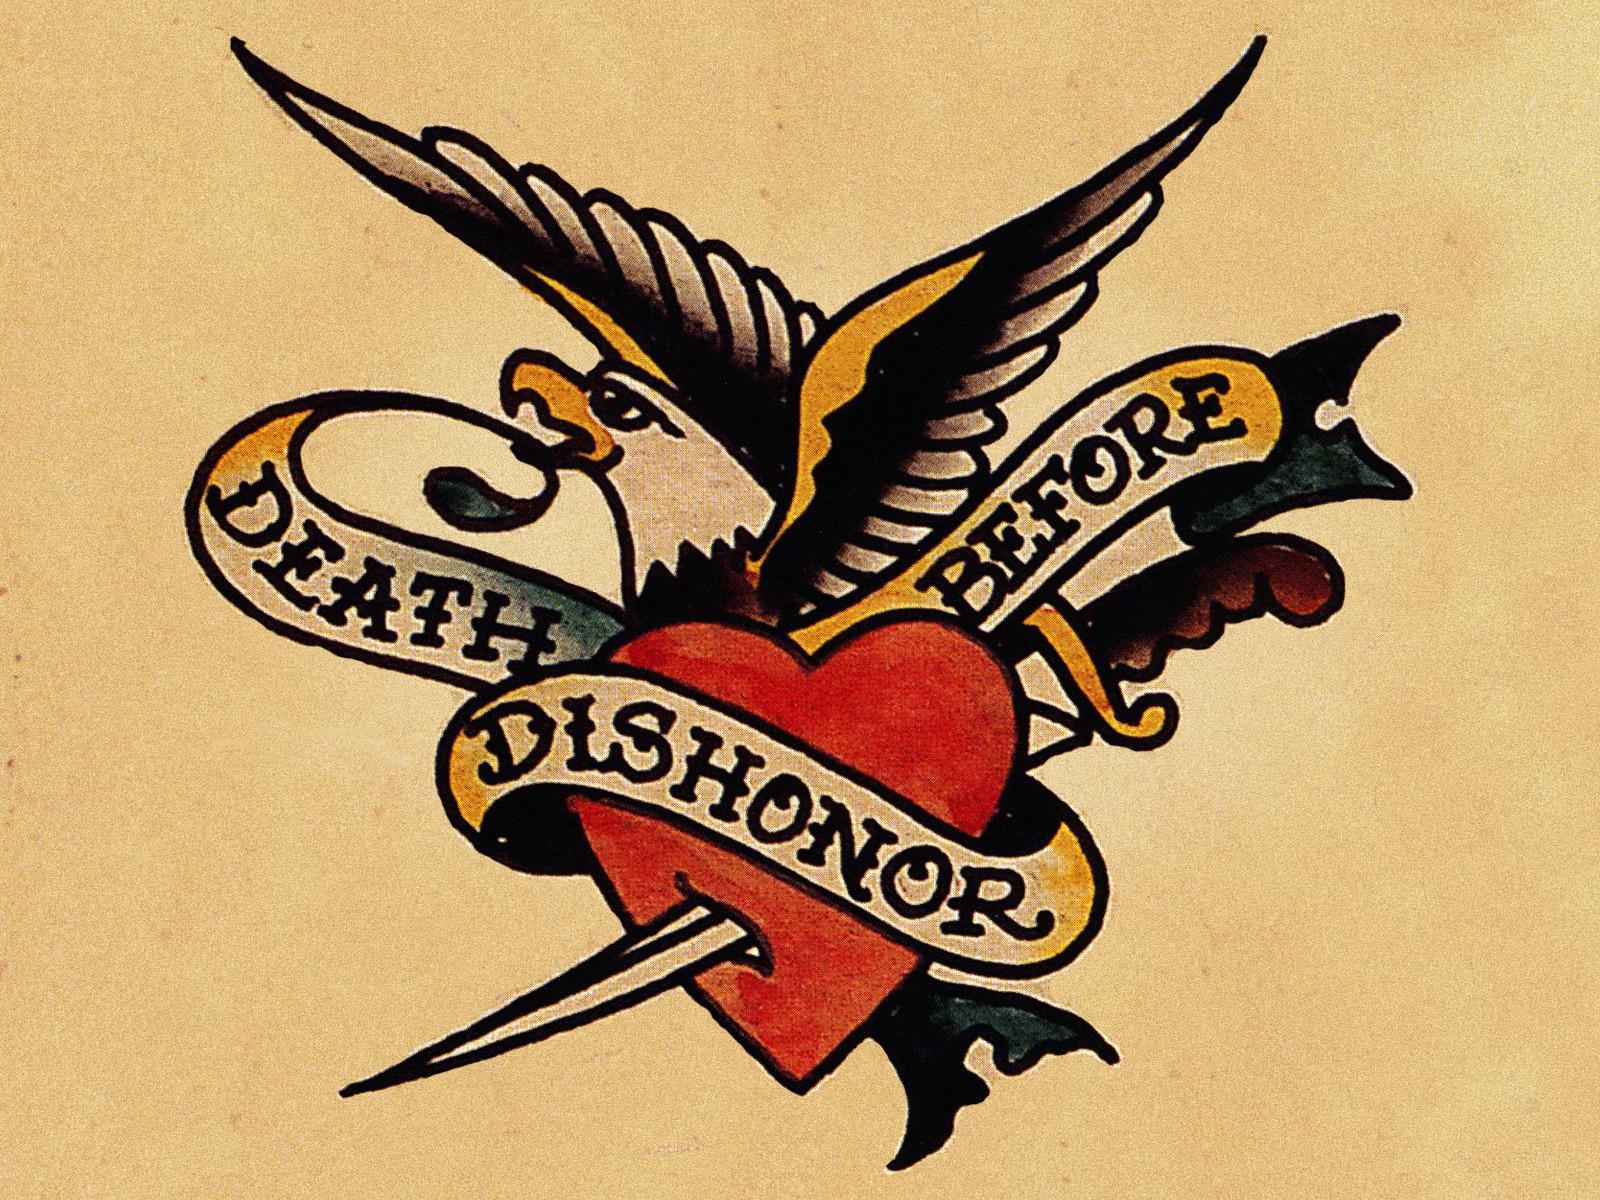 Harley Davidson Eagle Tattoo Designs